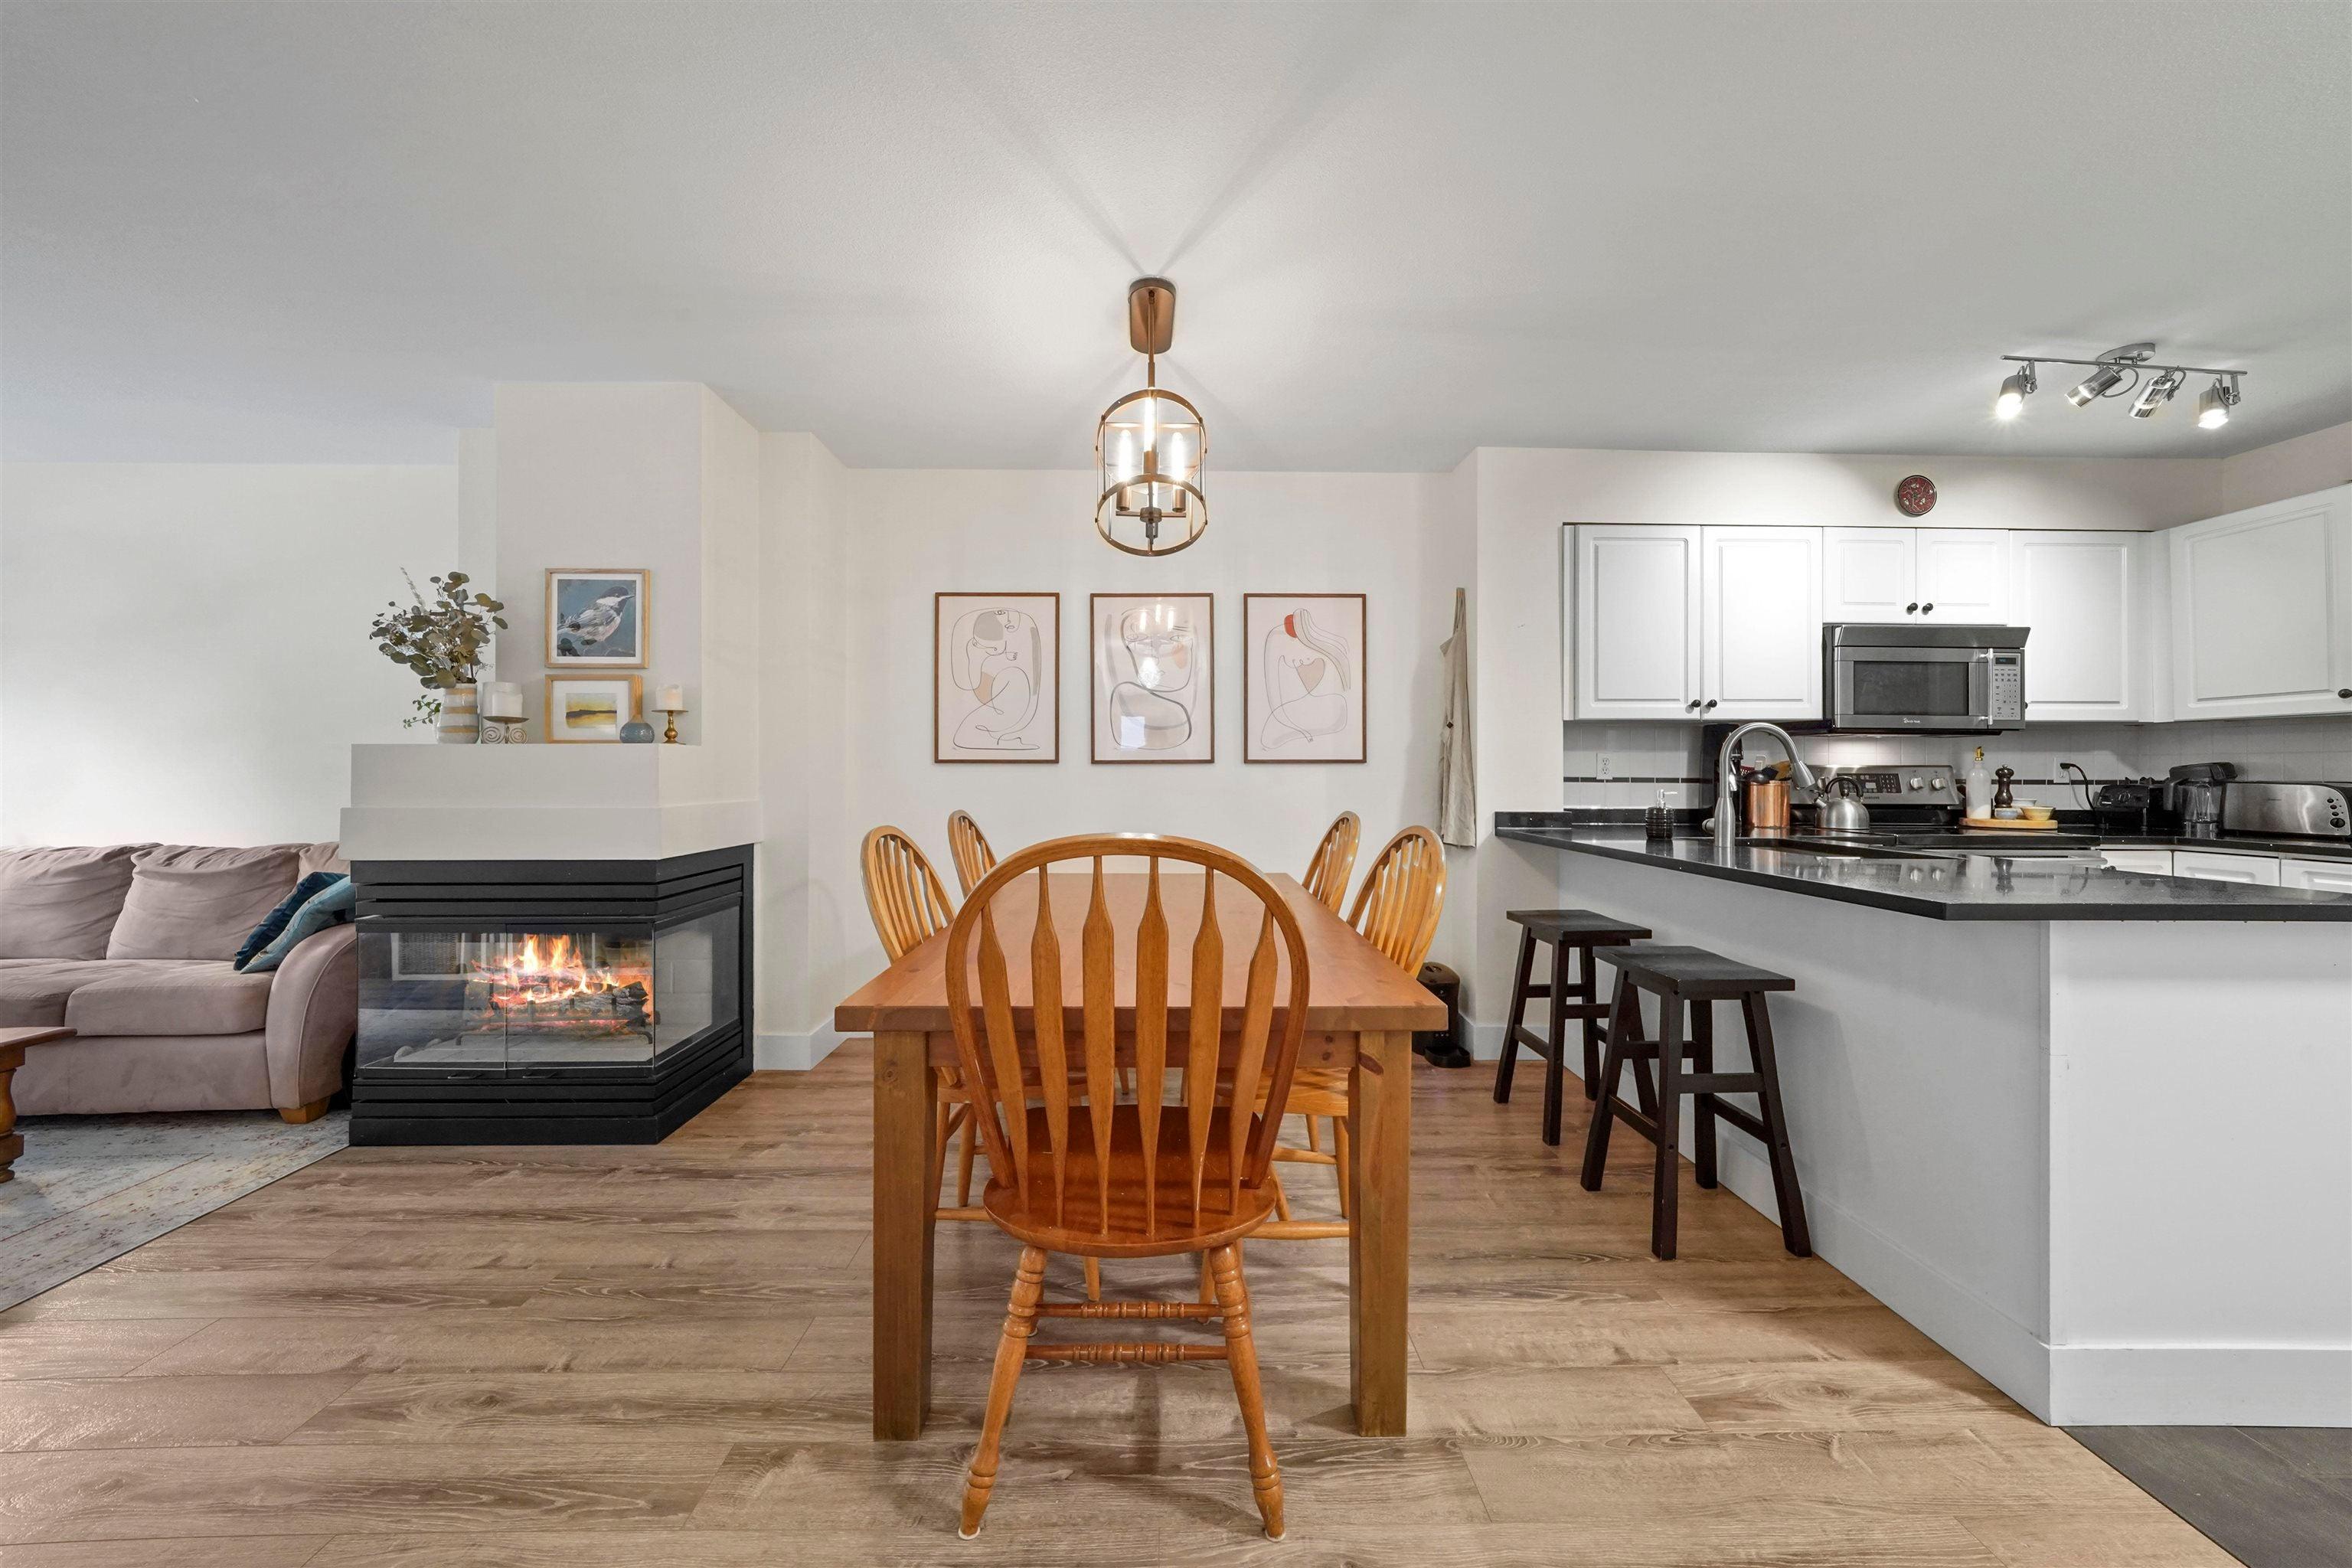 202 2815 YEW STREET - Kitsilano Apartment/Condo for sale, 2 Bedrooms (R2619527)